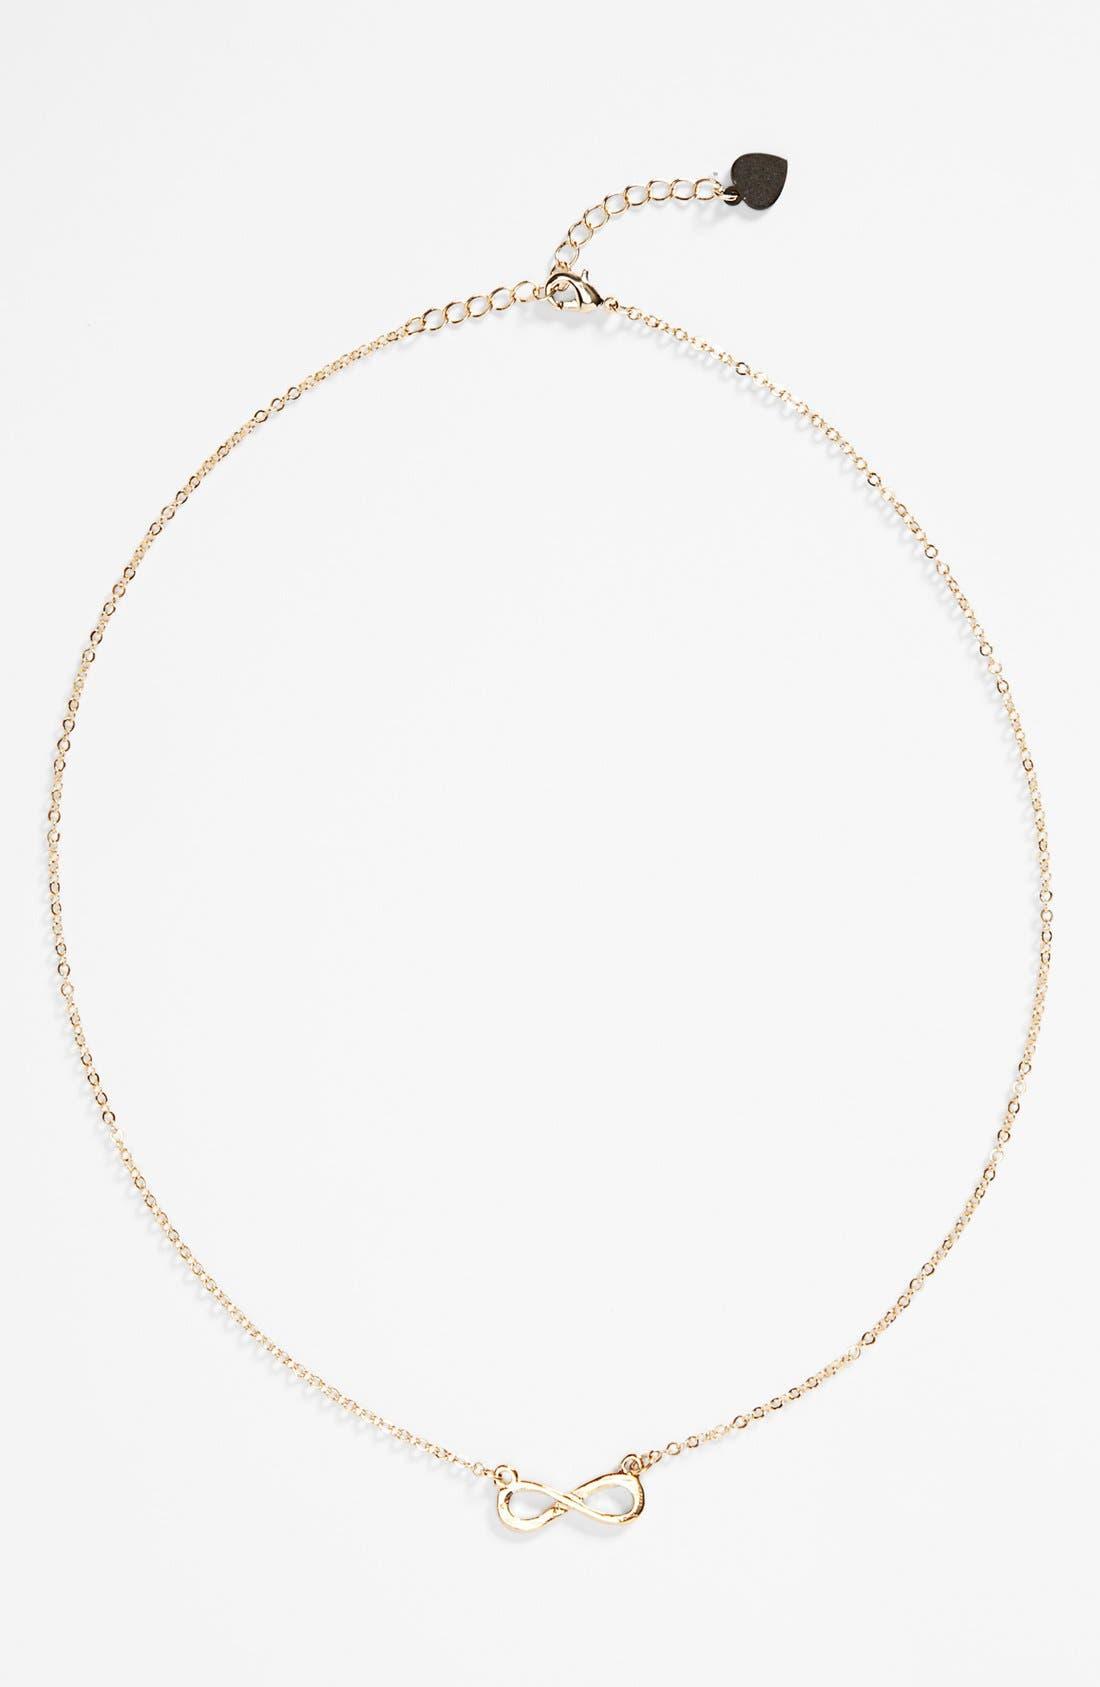 Main Image - Bonnie Jonas 'Infinity' Chain Necklace